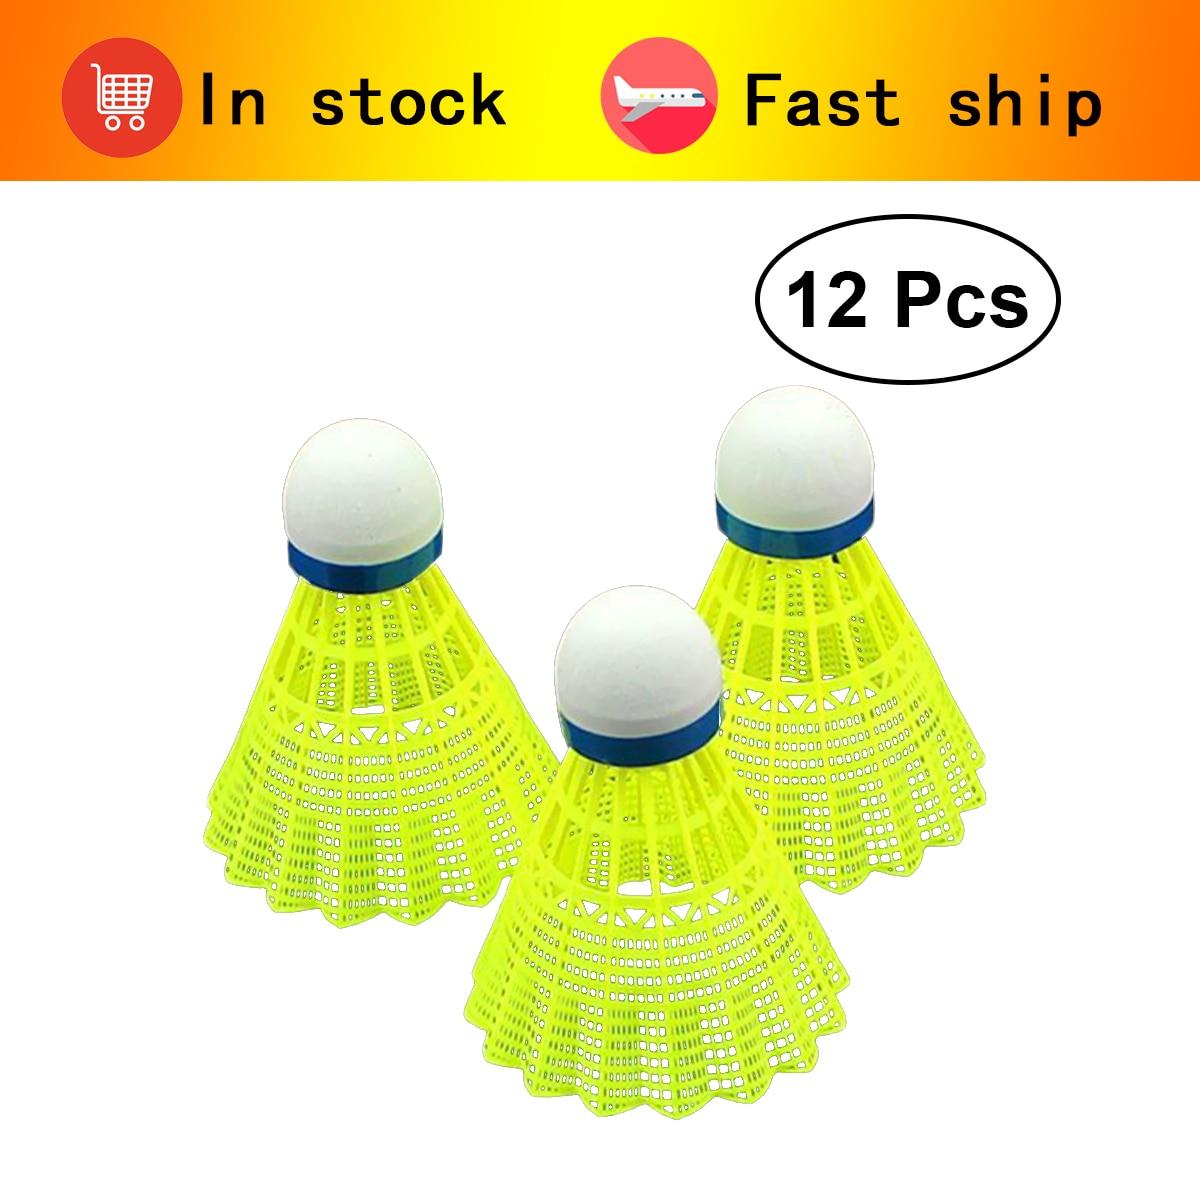 1pcs Nylon Shuttlecocks Great Stability Durability Advanced Hight Speed Badminton Ball Shuttlecocks For Outdoor Indoor